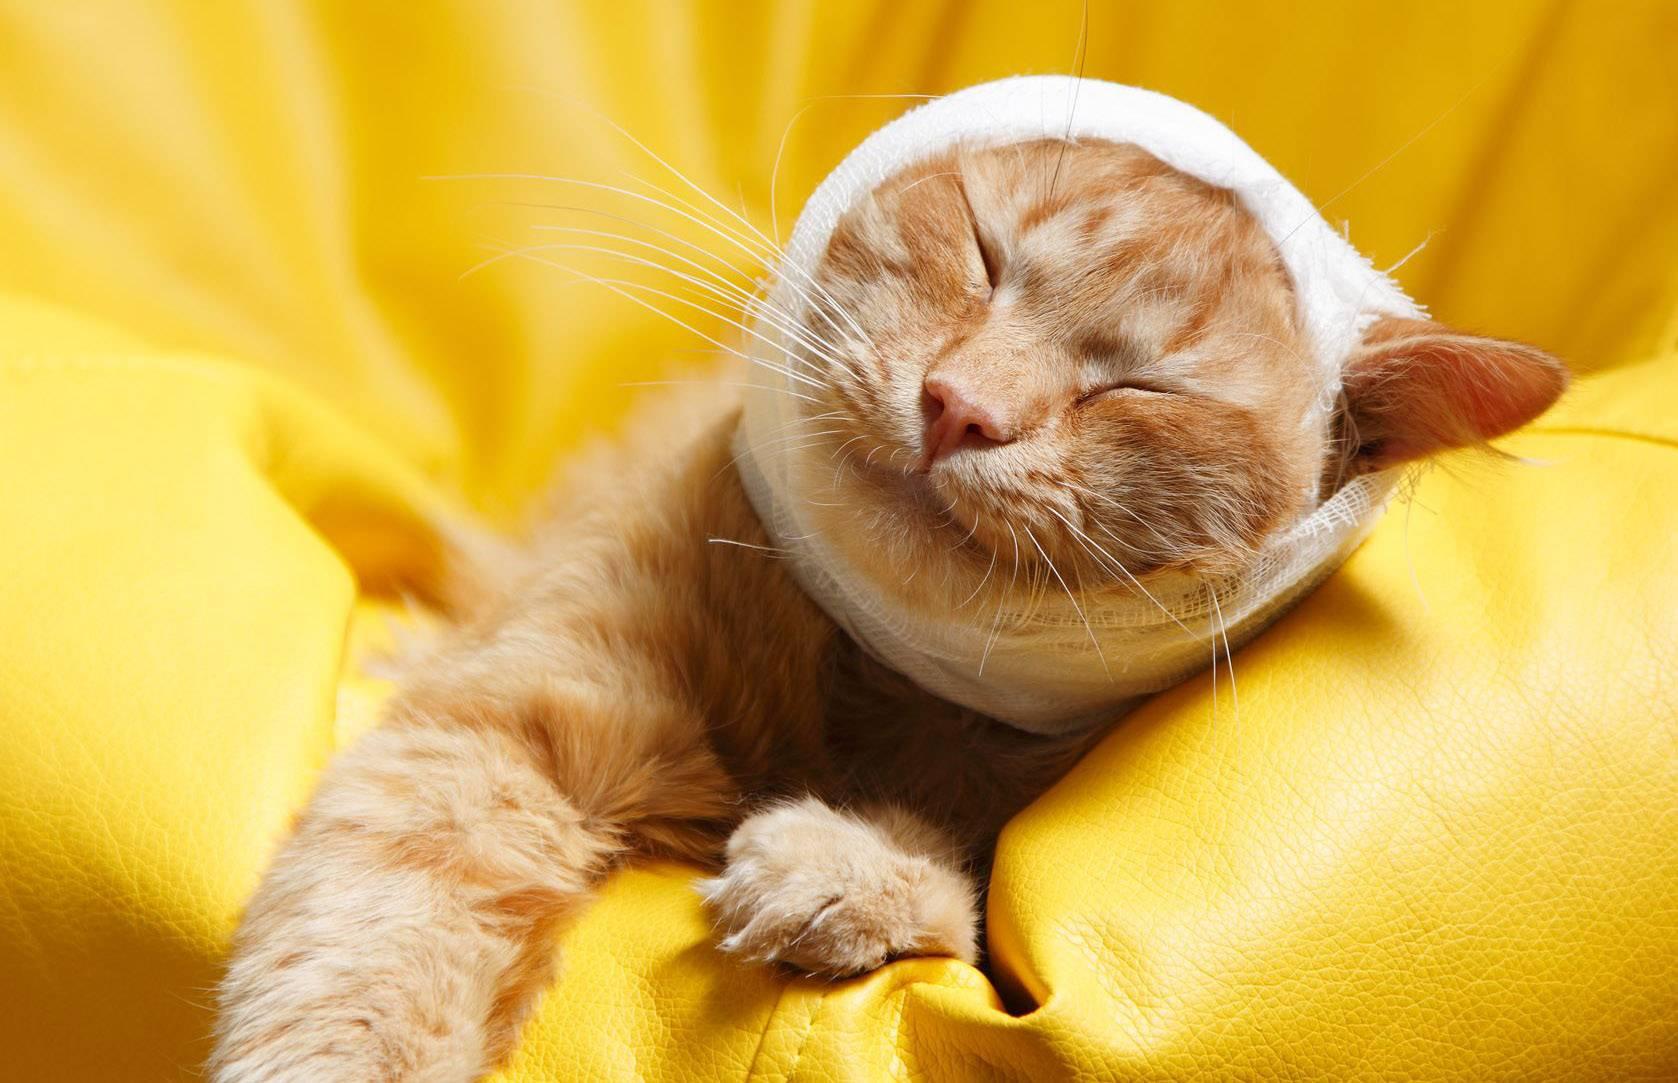 Лечение шишок на животе и на шее под кожей у кошки